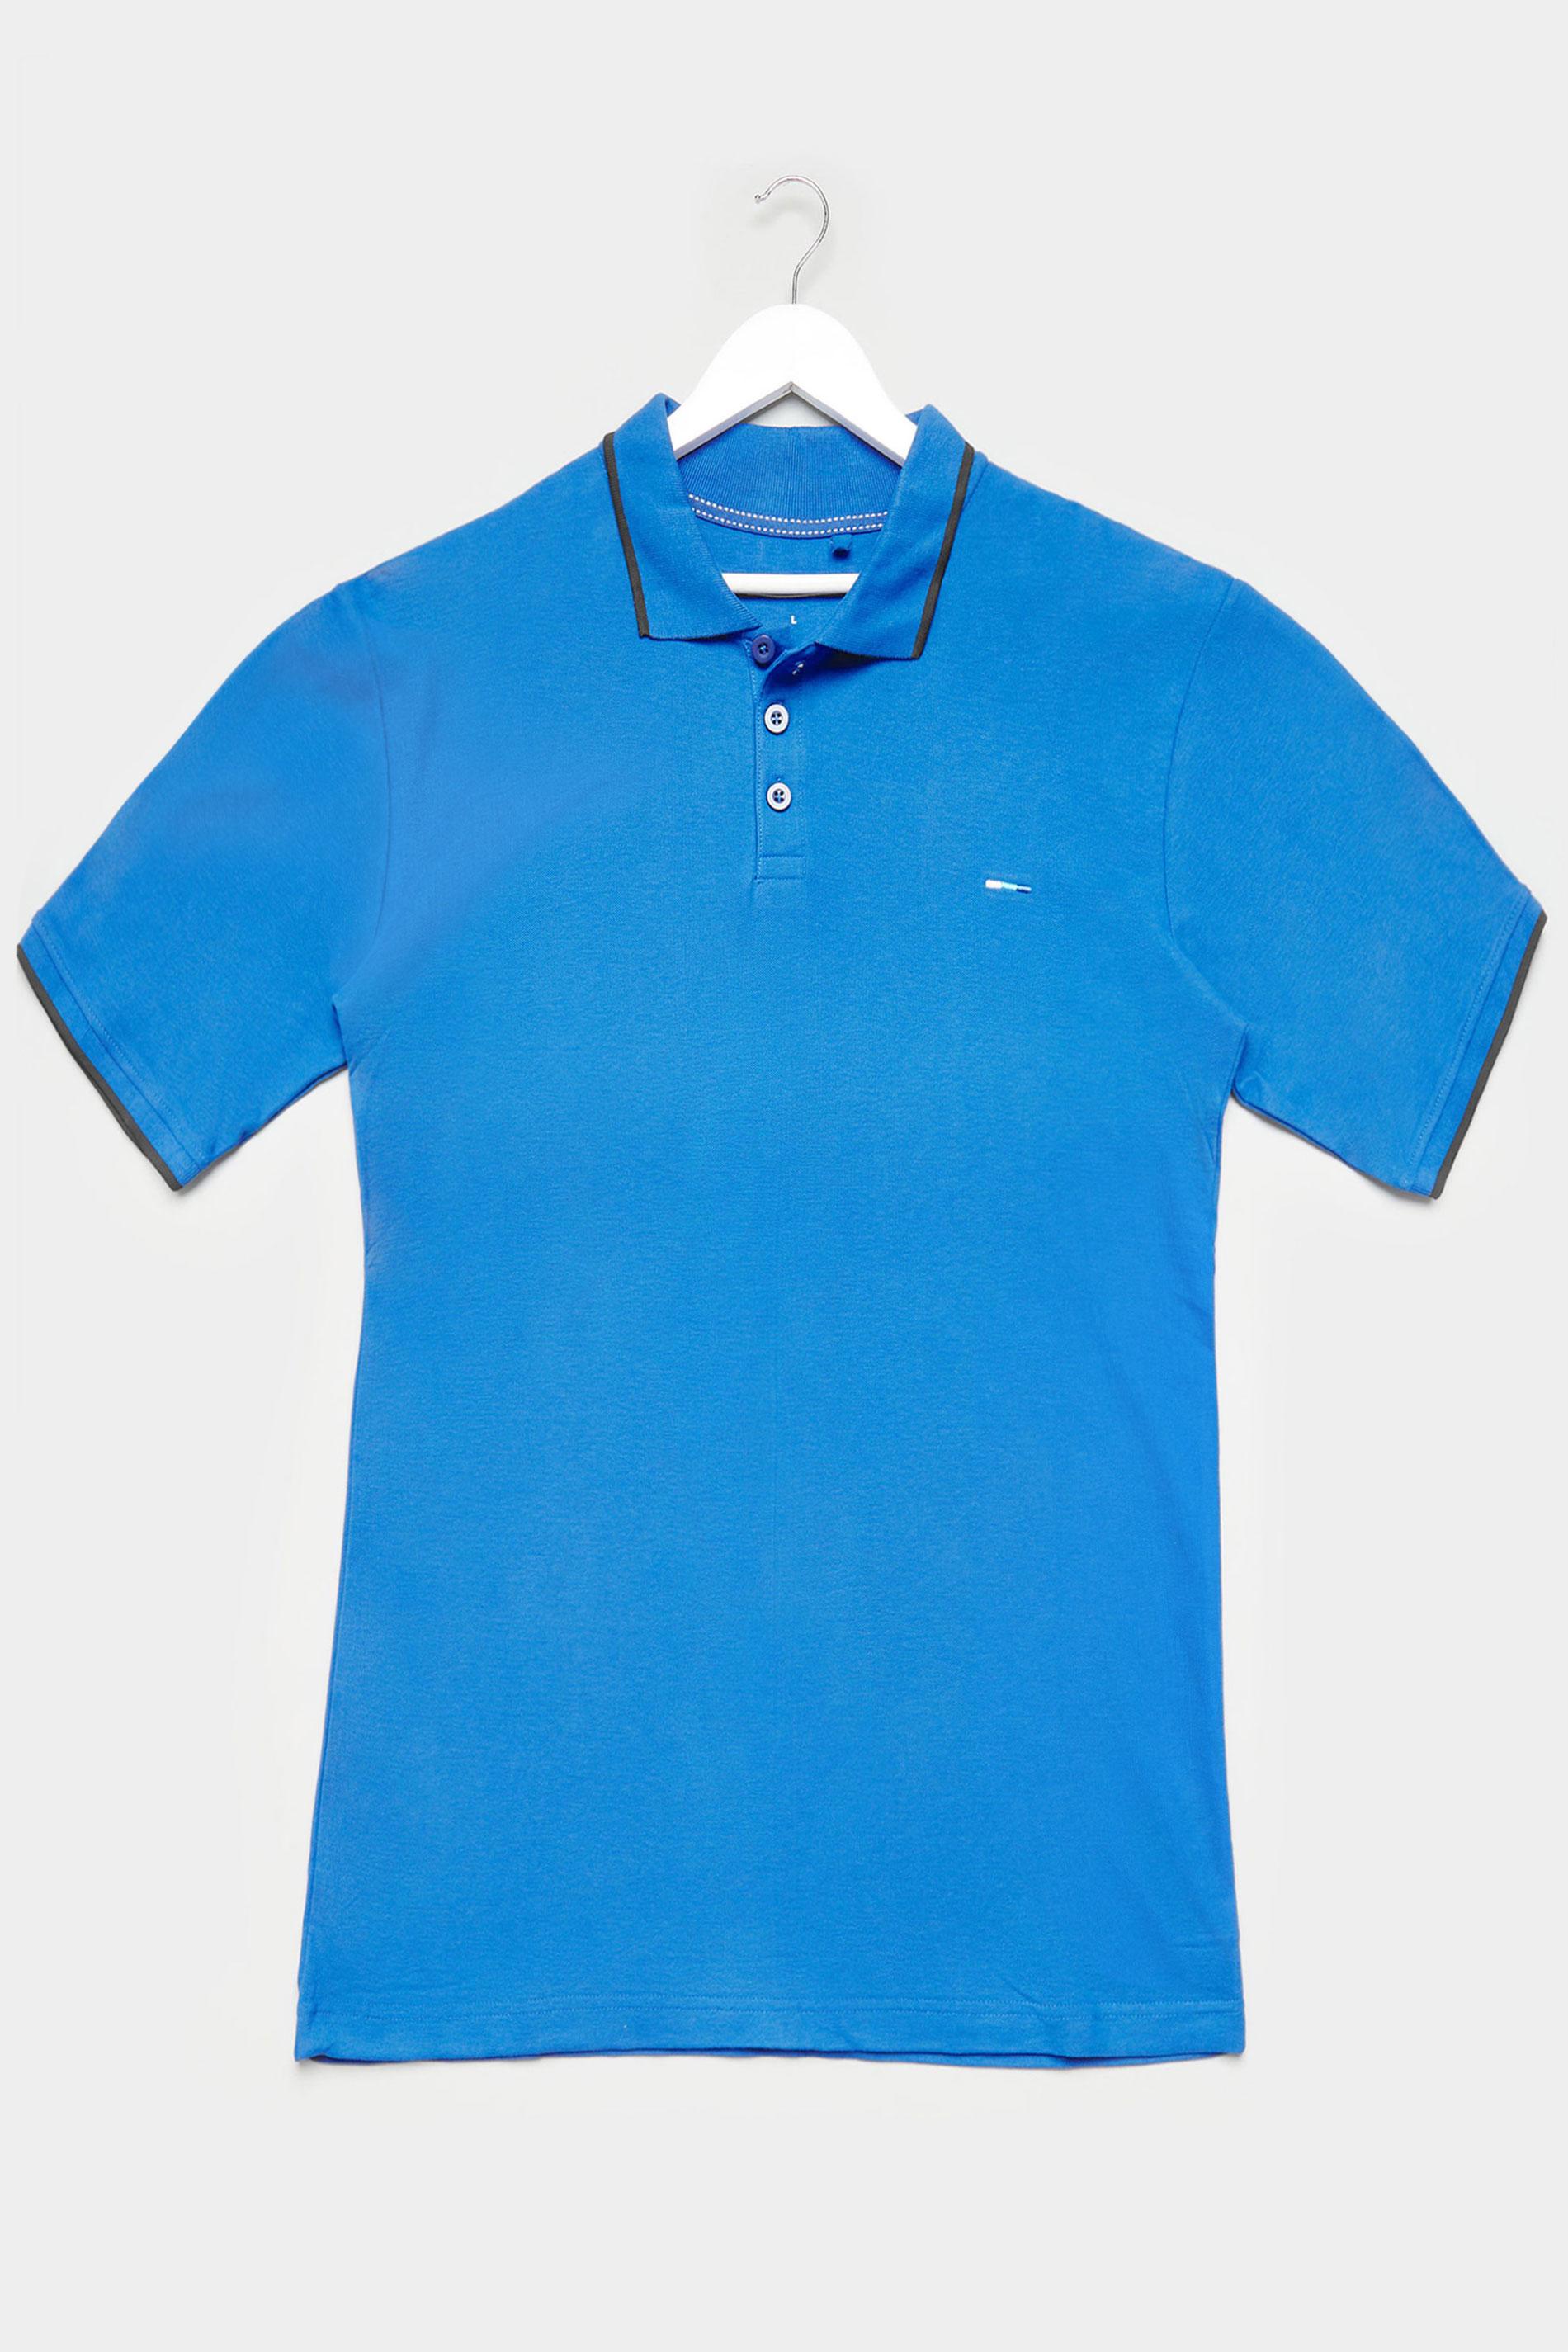 BadRhino Marine Blue Contrast Tipped Polo Shirt